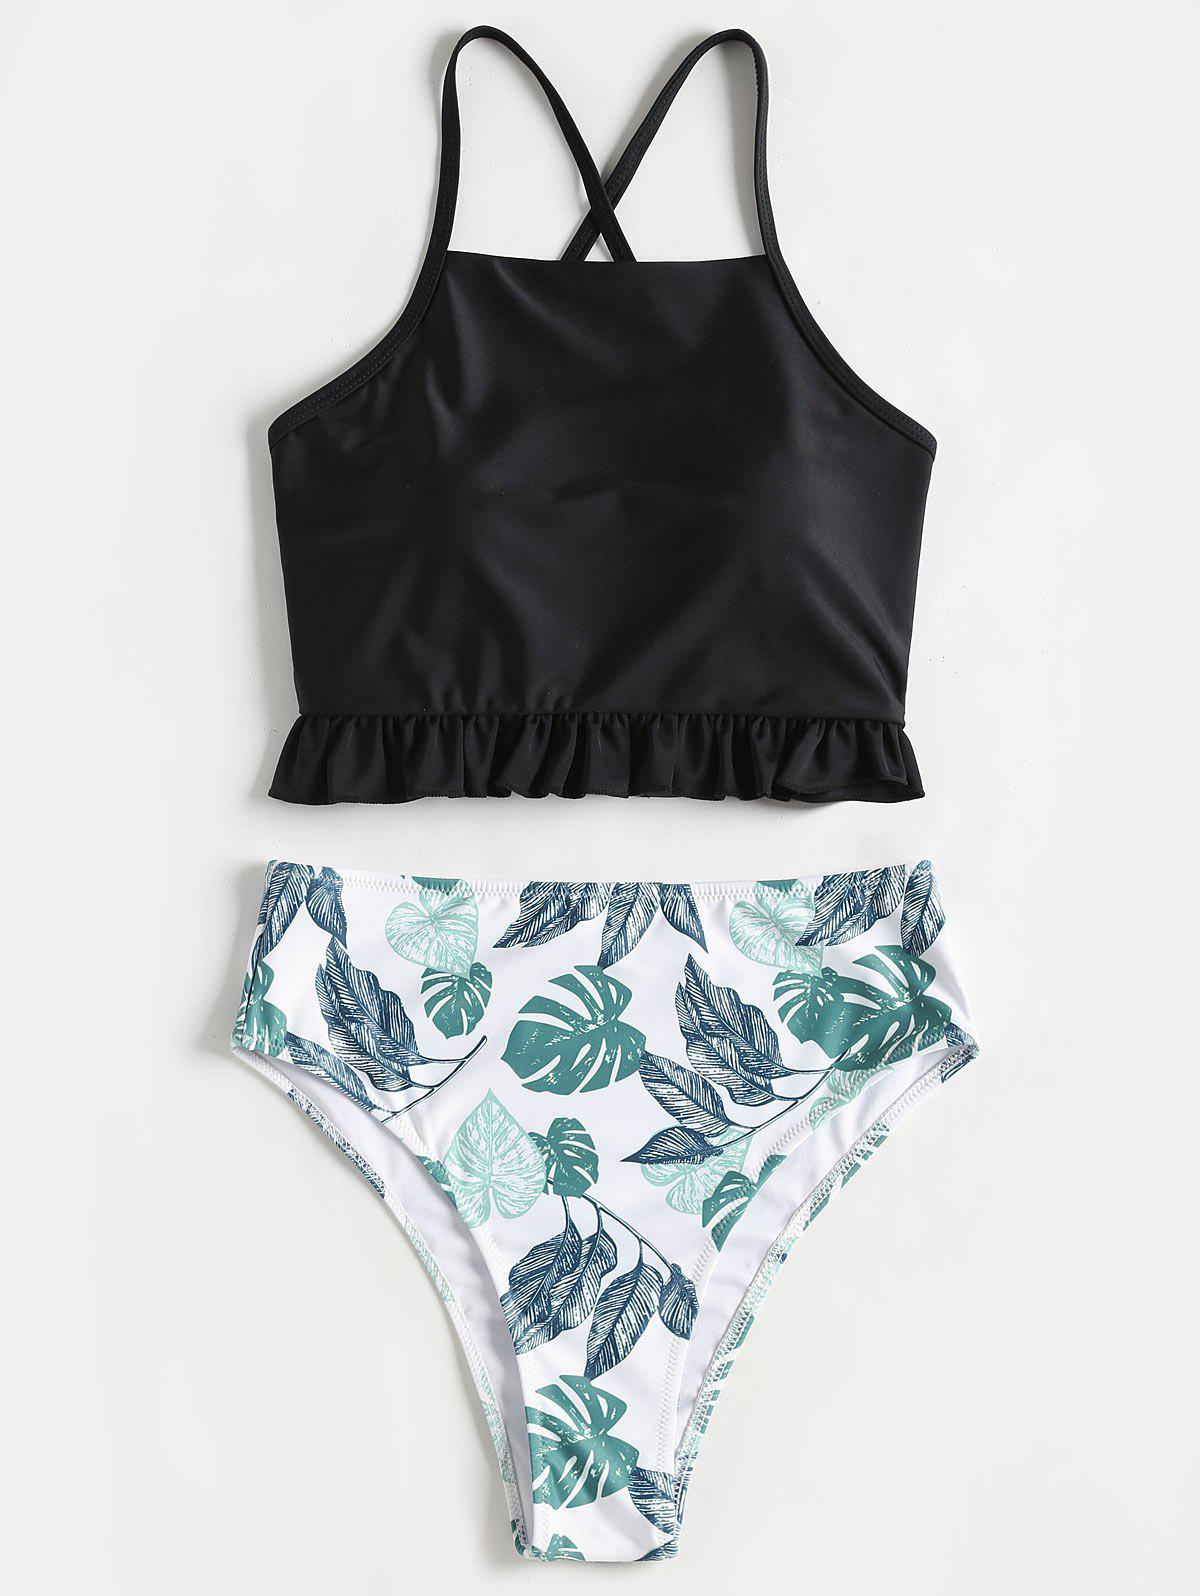 Lace Up Palm Leaf High Cut Bikini Set 236660901